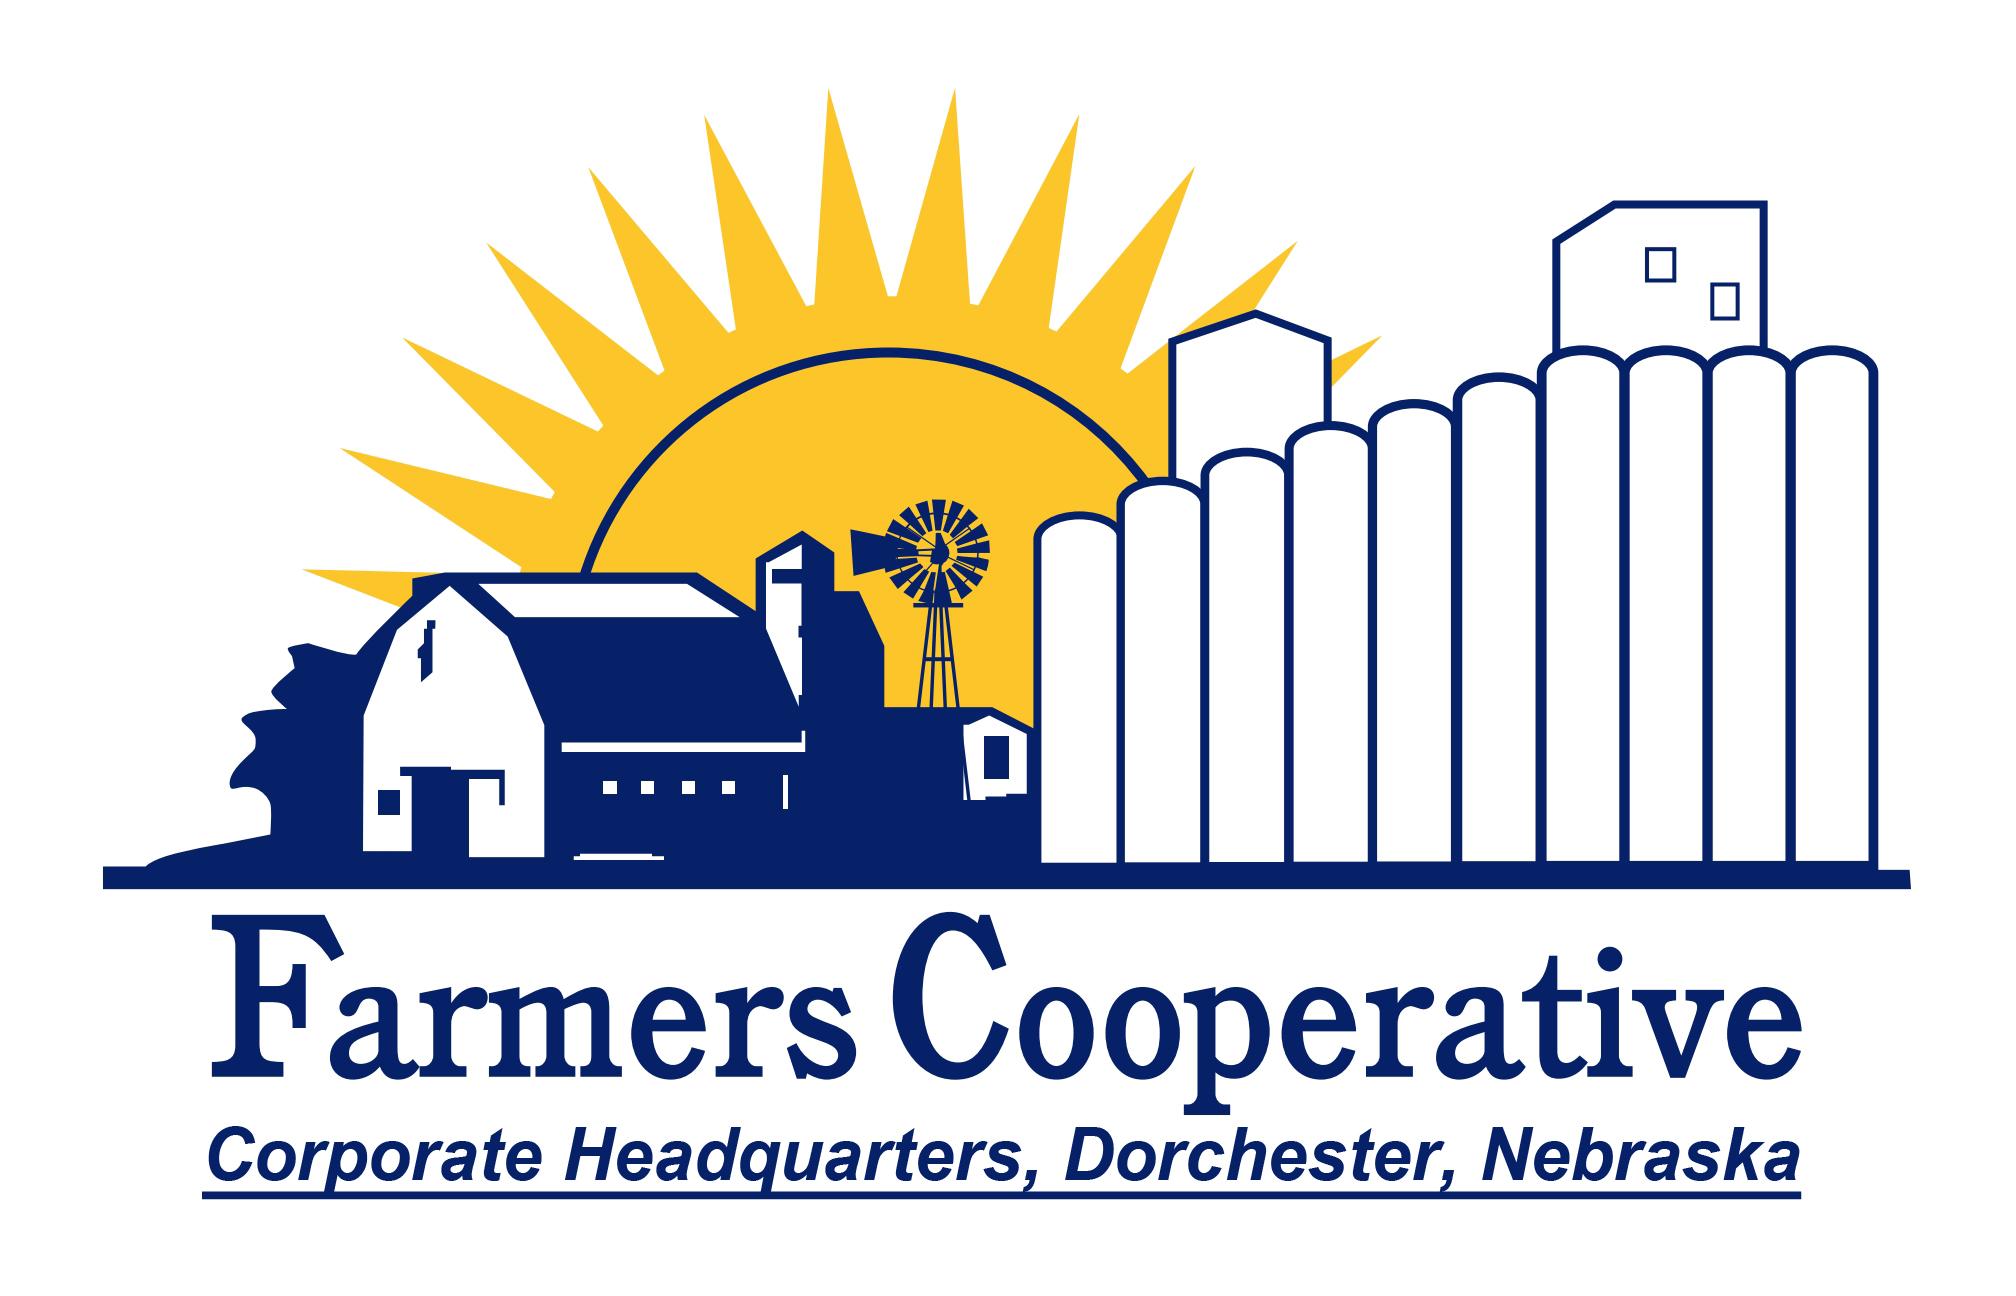 Farmers Cooperative donates to local FFA Chapter Grants